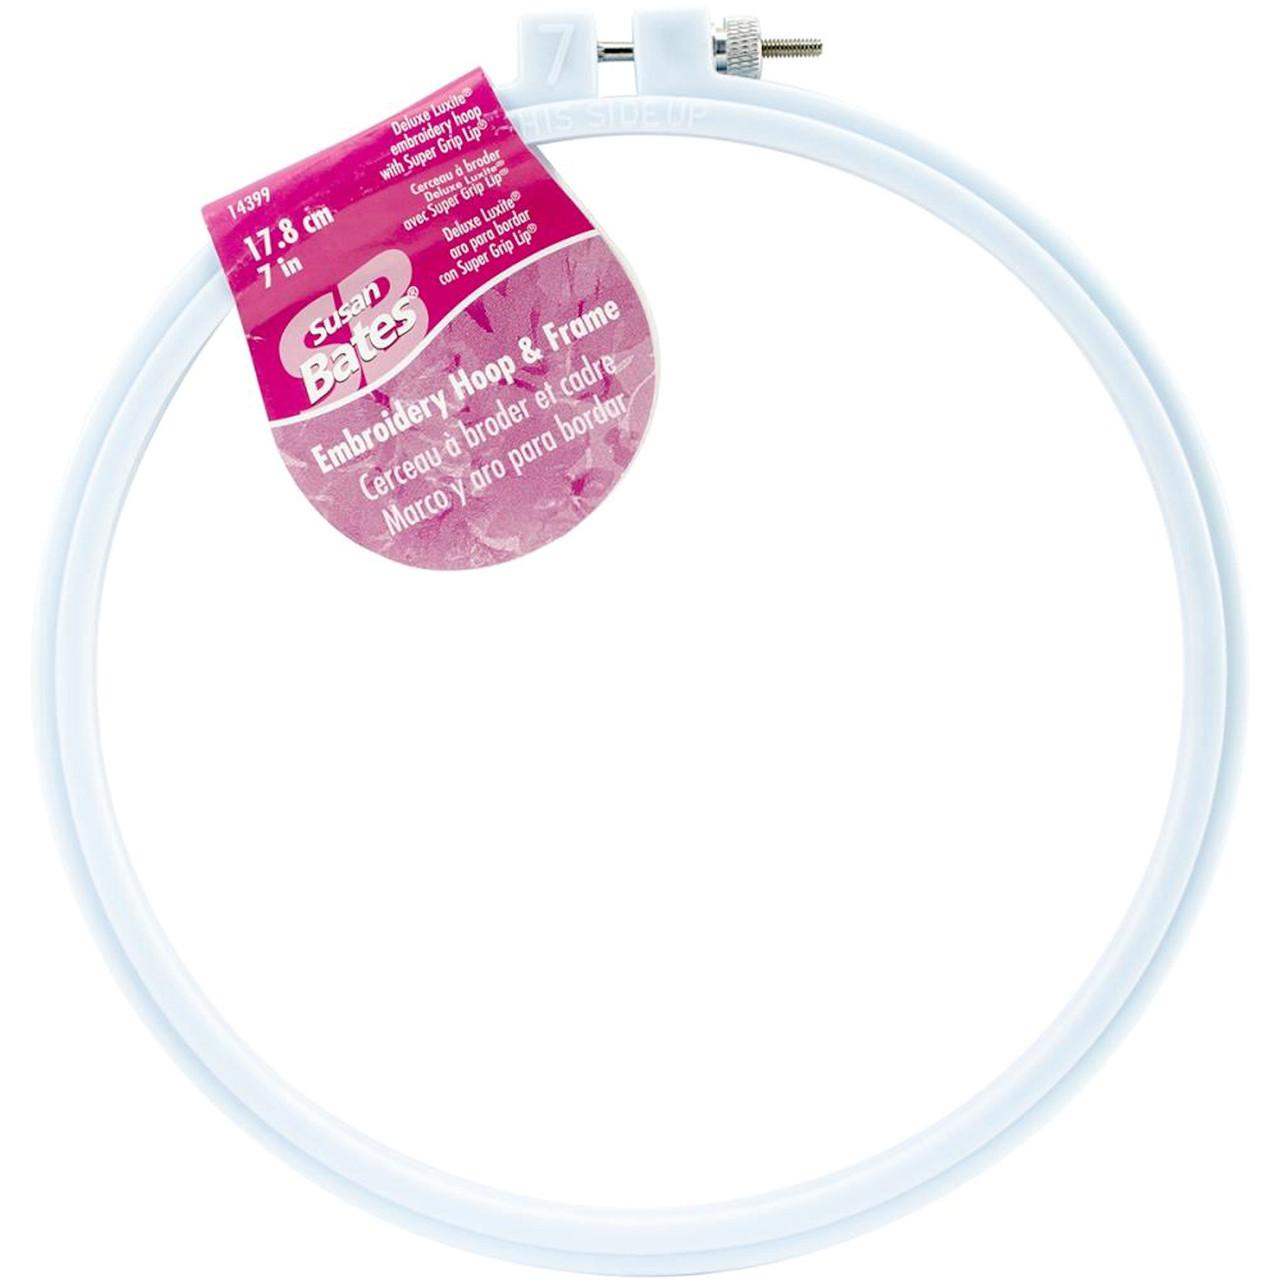 Susan Bates - 7 in Deluxe Luxite Embroidery Hoop